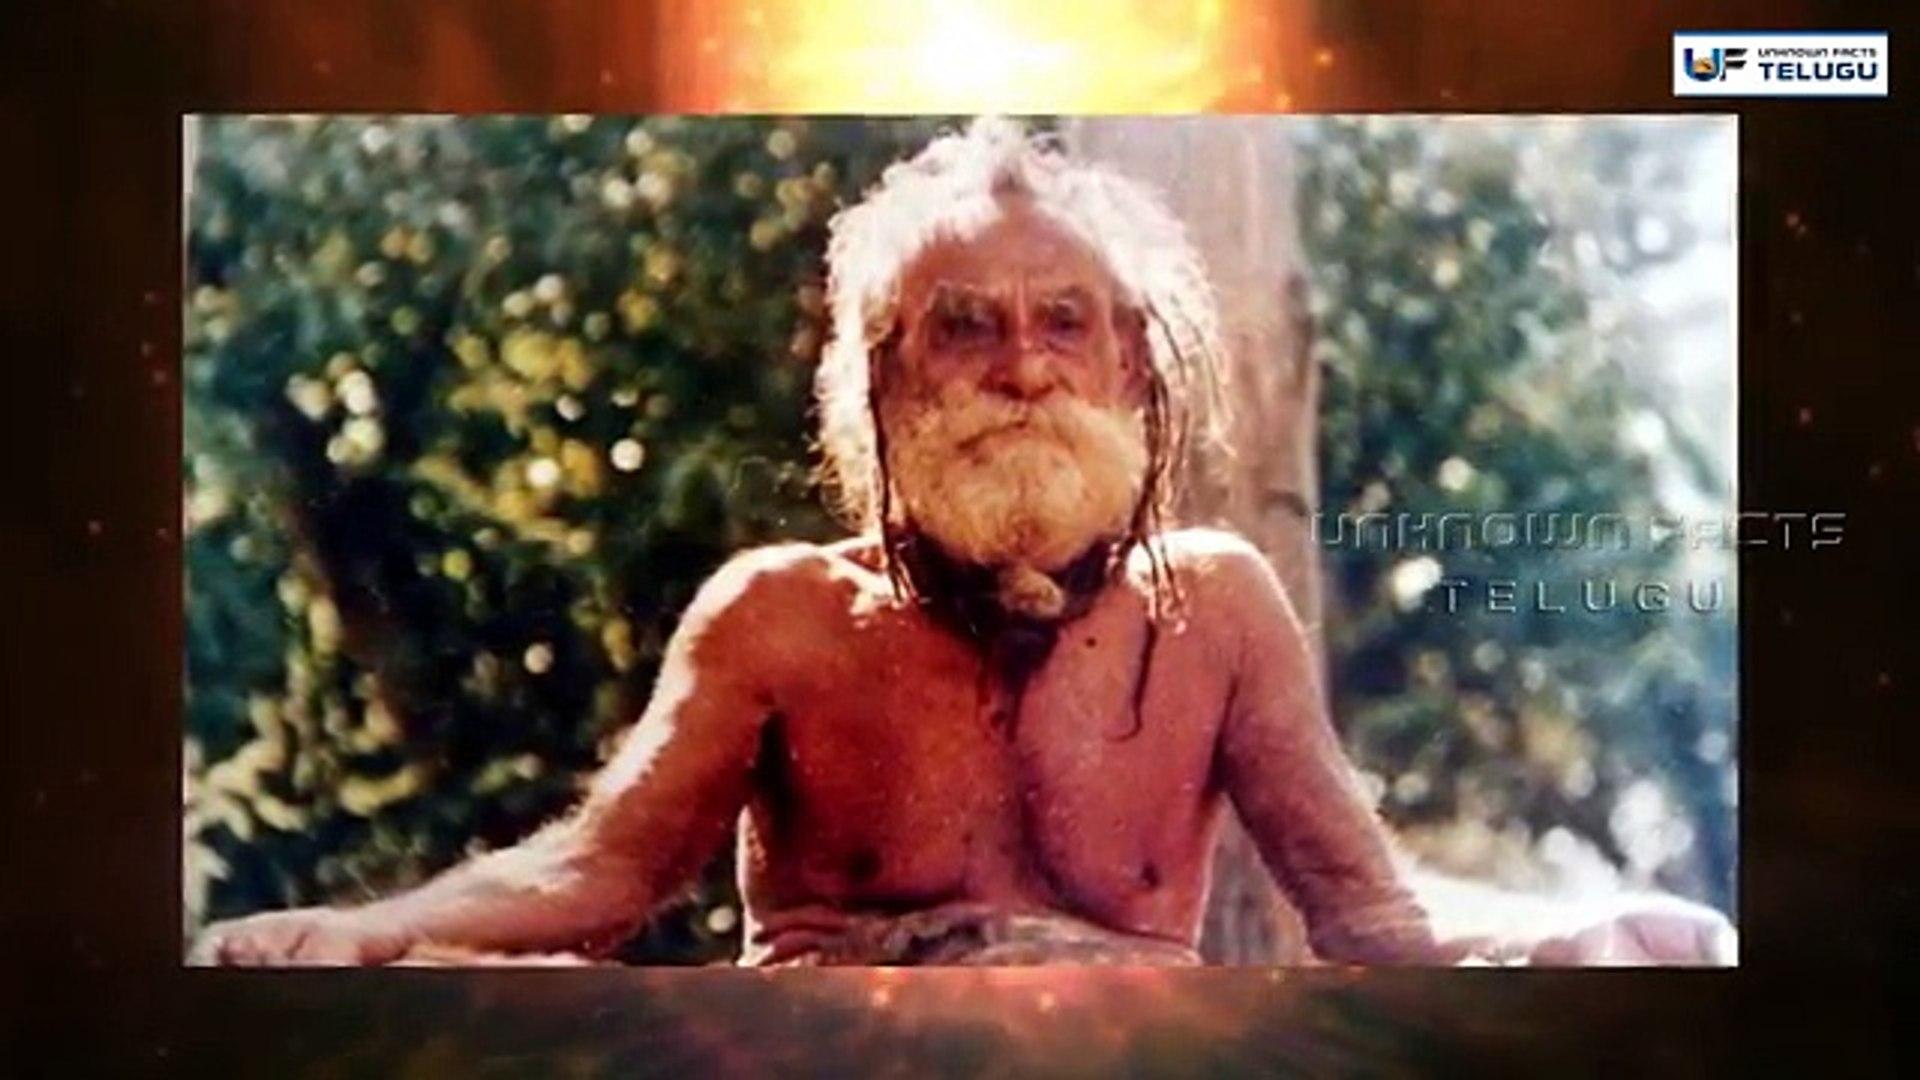 Biggest secrets of Aghori & Sadhus || అఘోరాలు, సాధువుల గురించి ఆసక్తికరమైన  నిజాలు